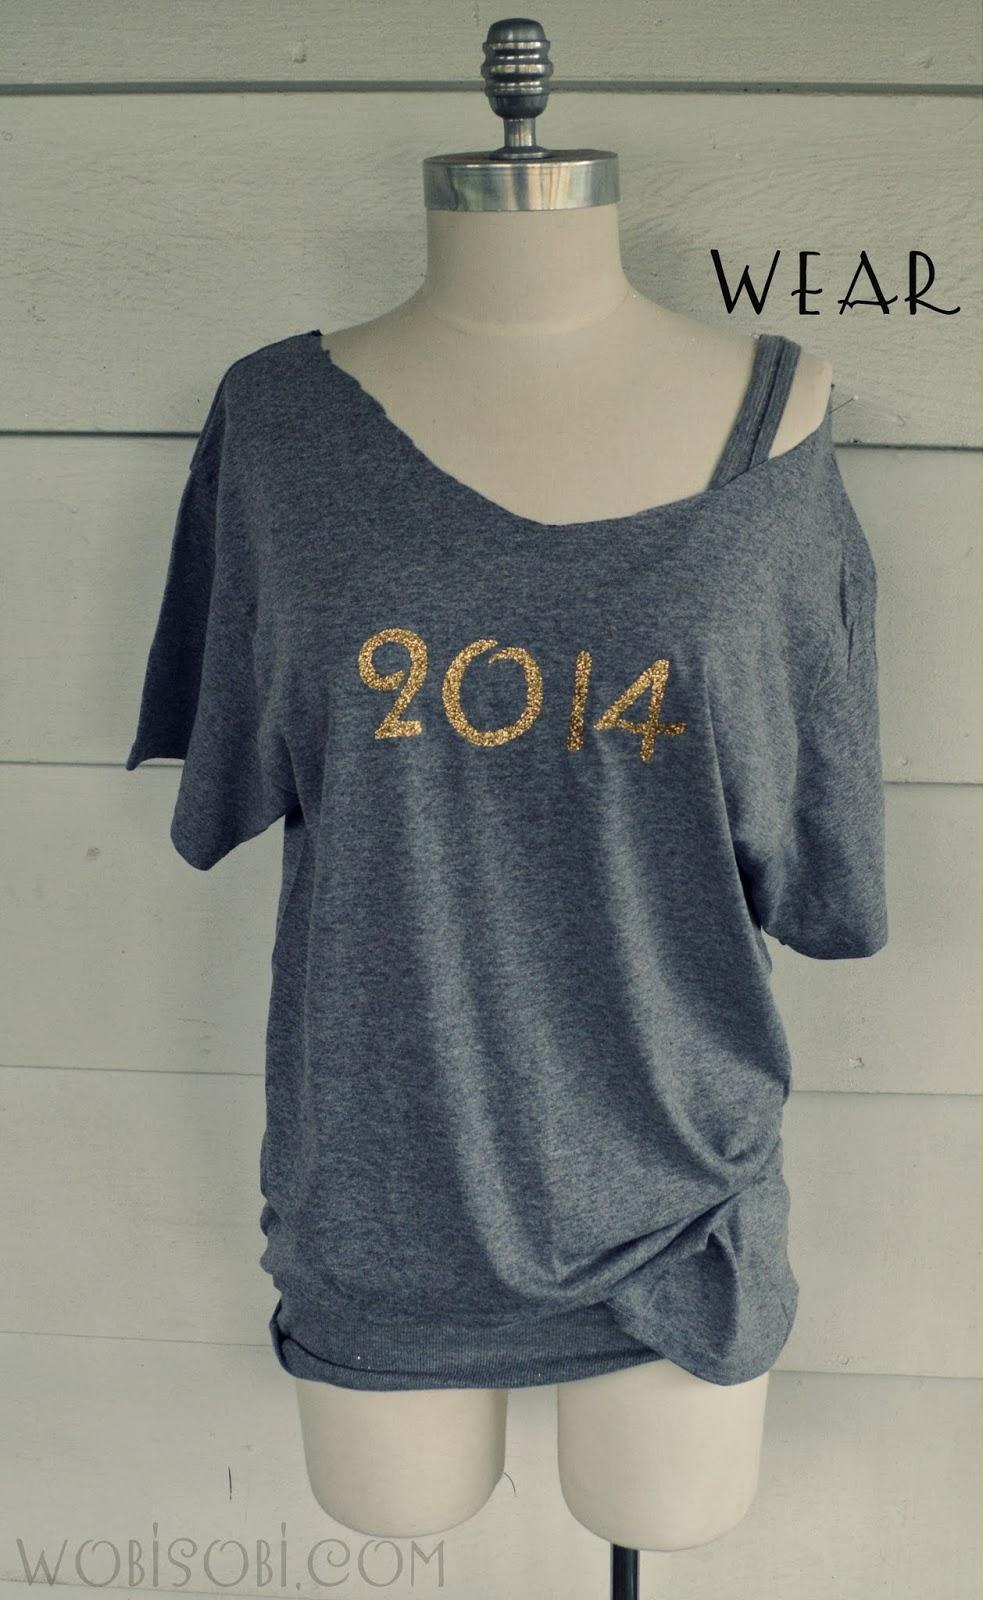 WobiSobi: Glitter 2014 Tee-shirt, DIY | 983 x 1600 jpeg 238kB